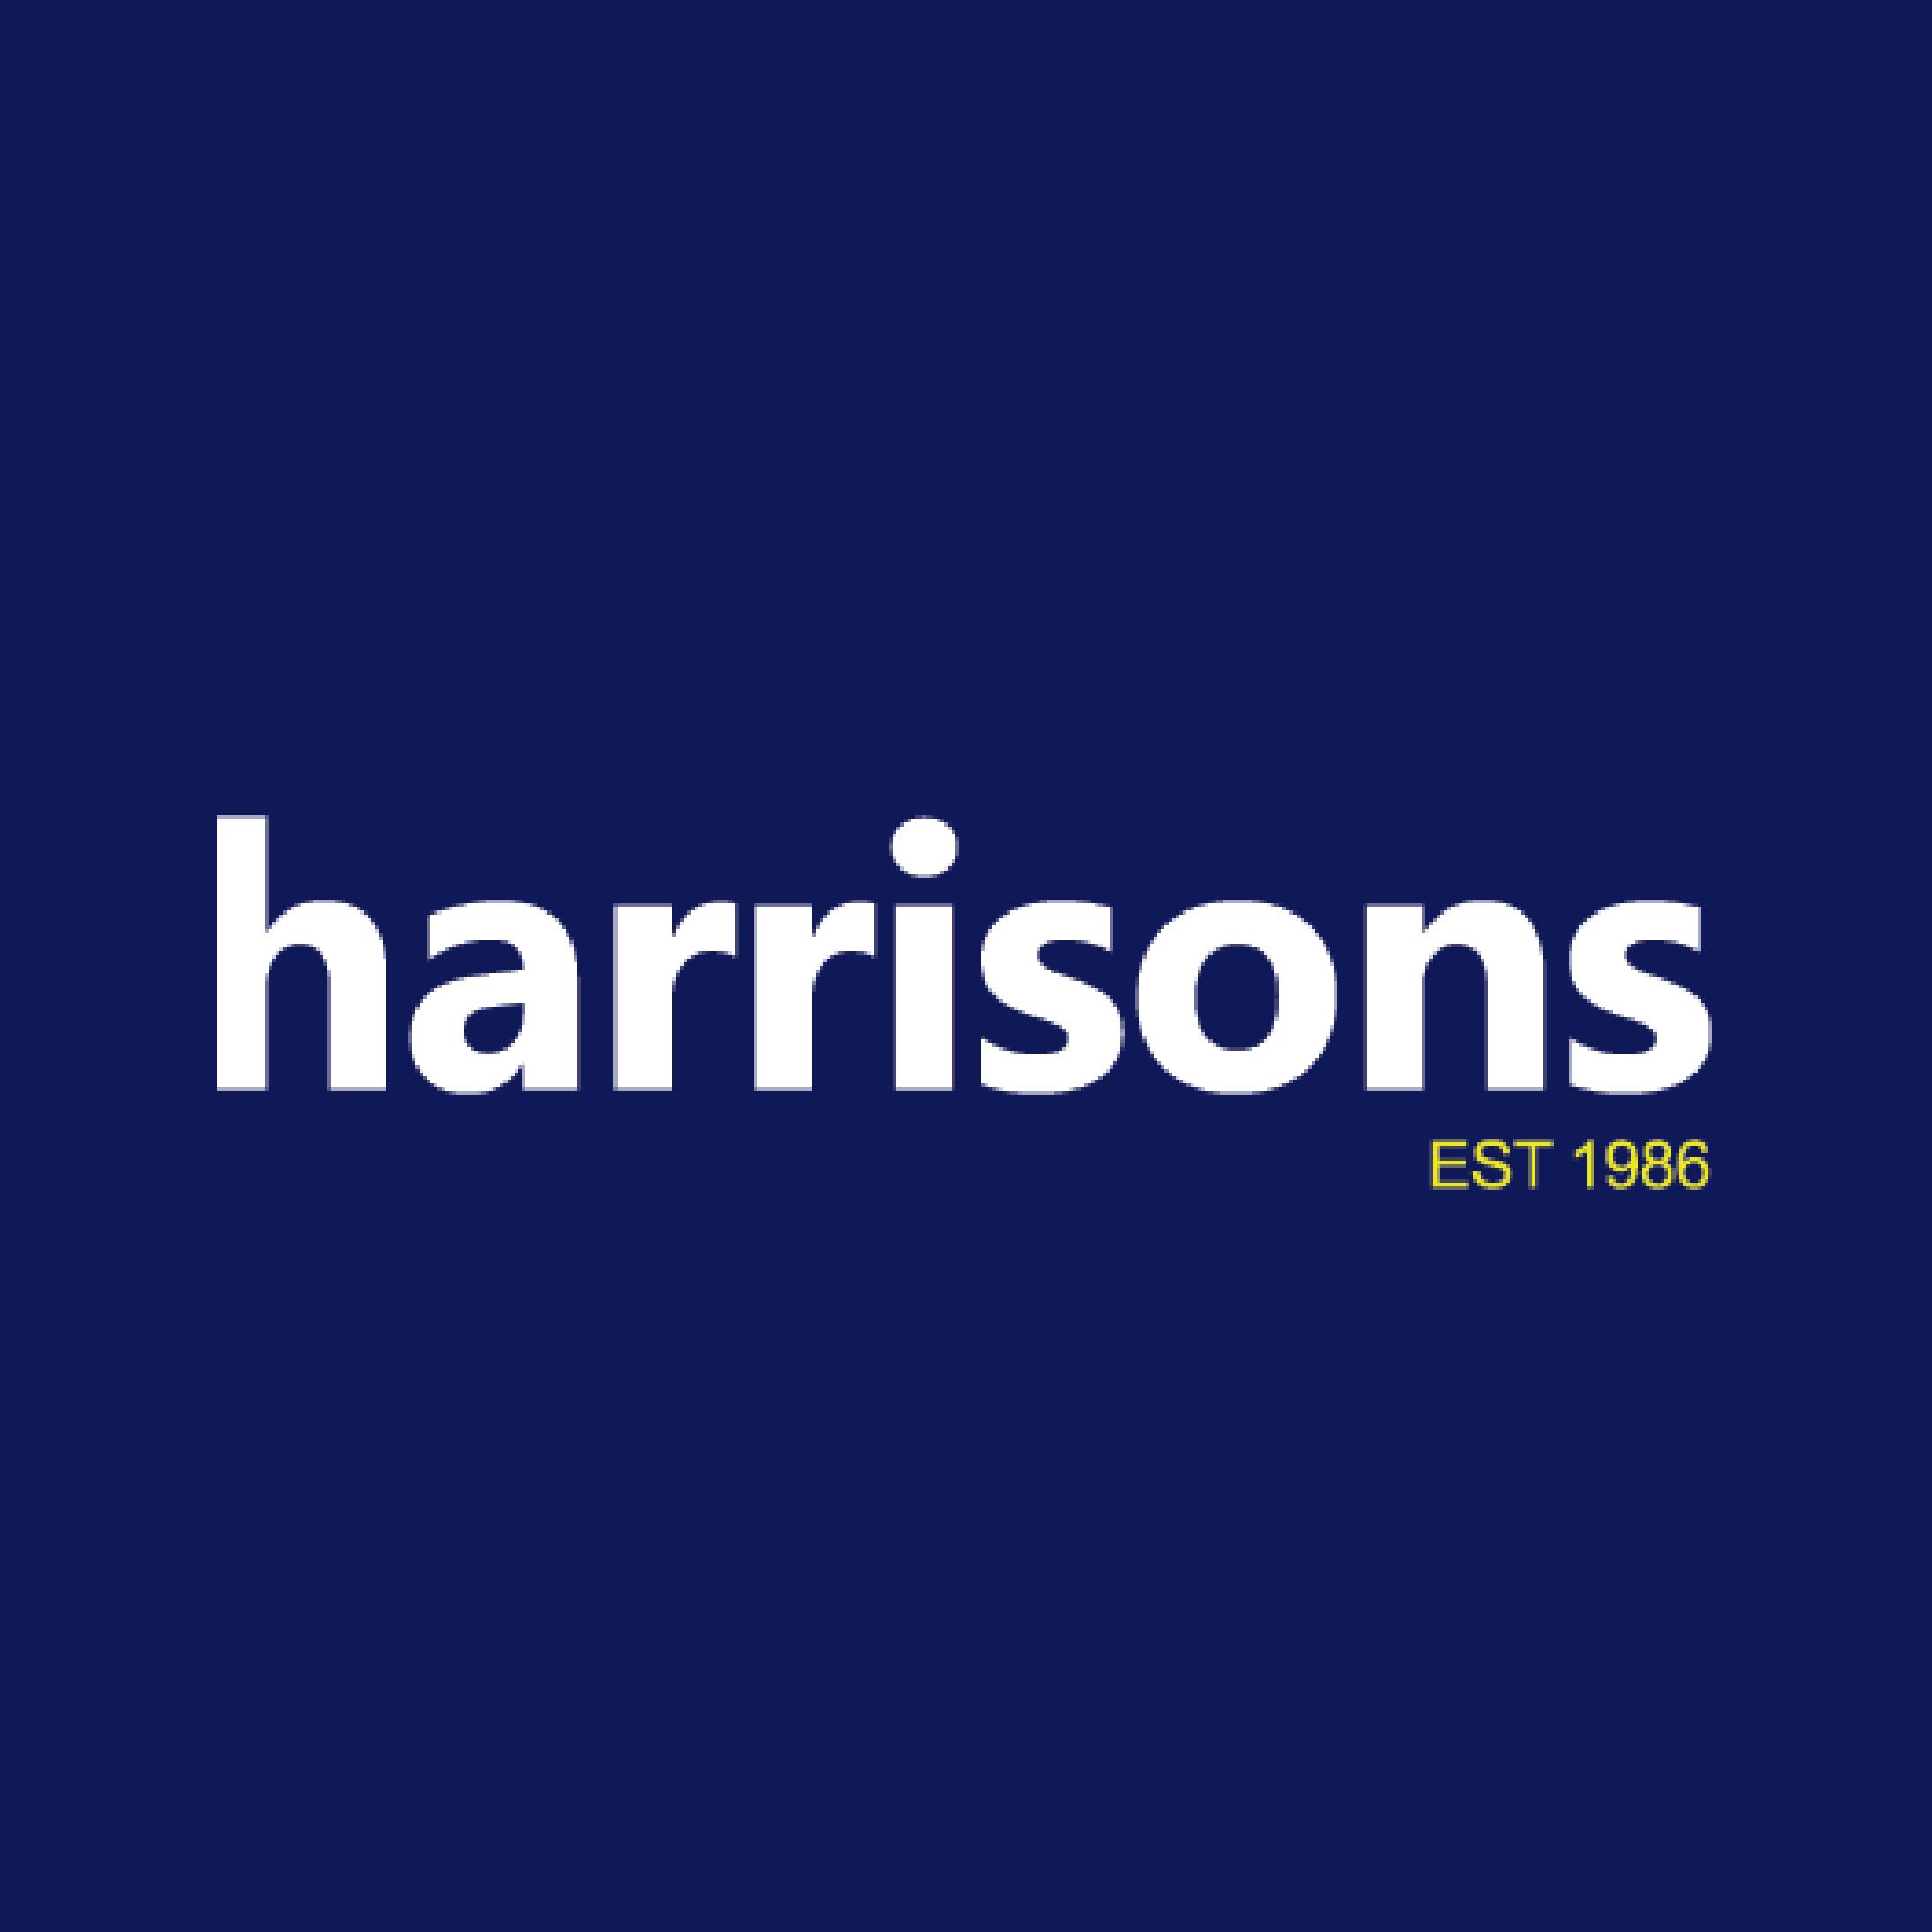 Harrisons-logo.jpg